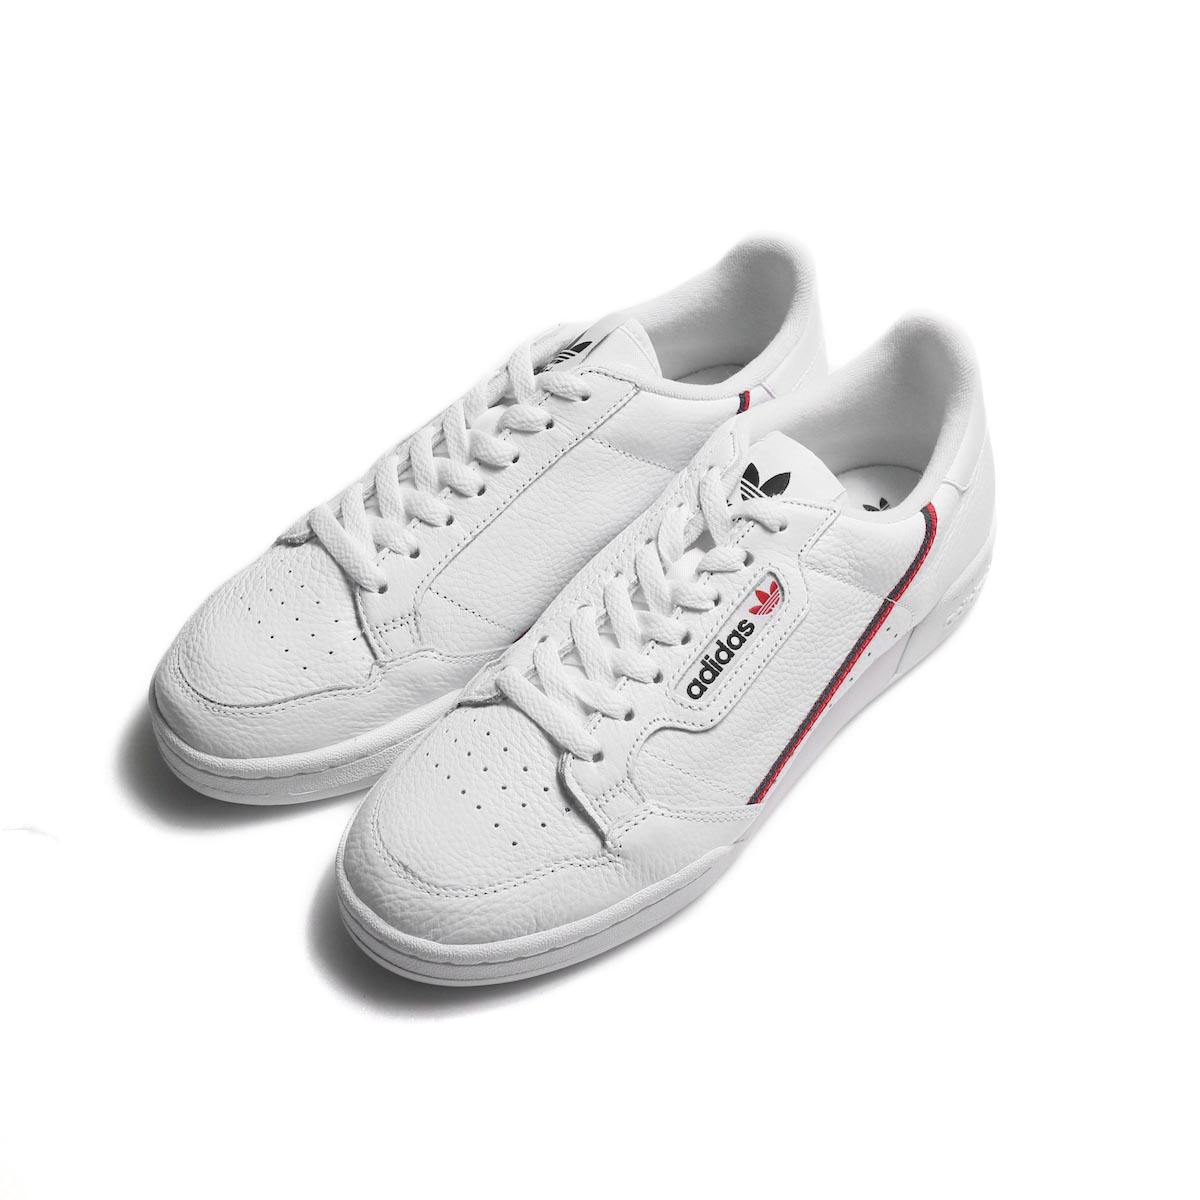 adidas originals / CONTINENTAL80 (G27706) -White 前サイド